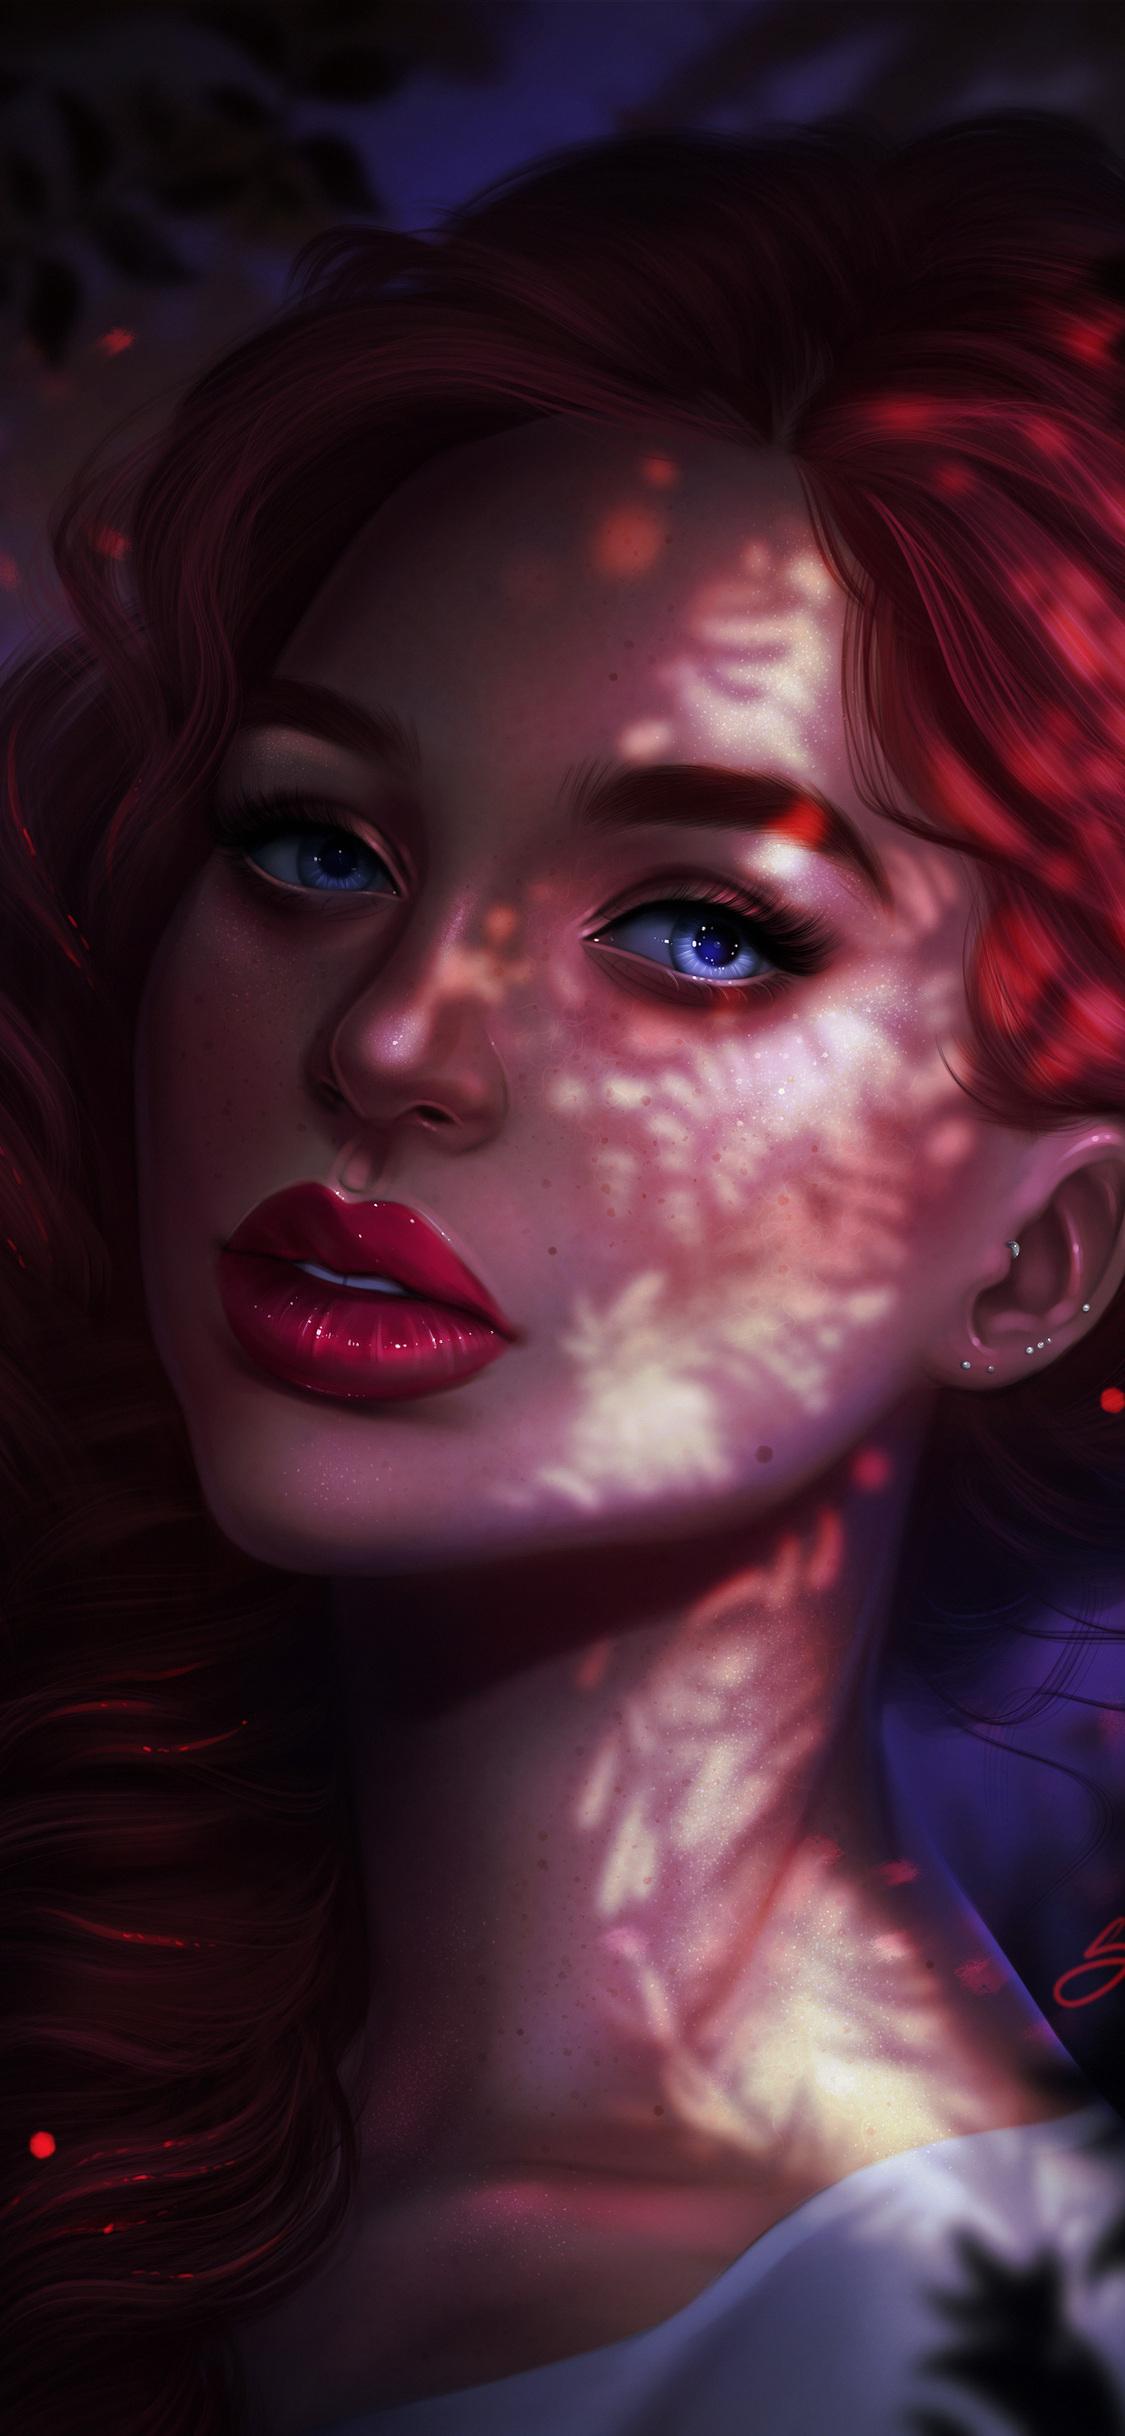 red-head-girl-portrait-face-closeup-a7.jpg